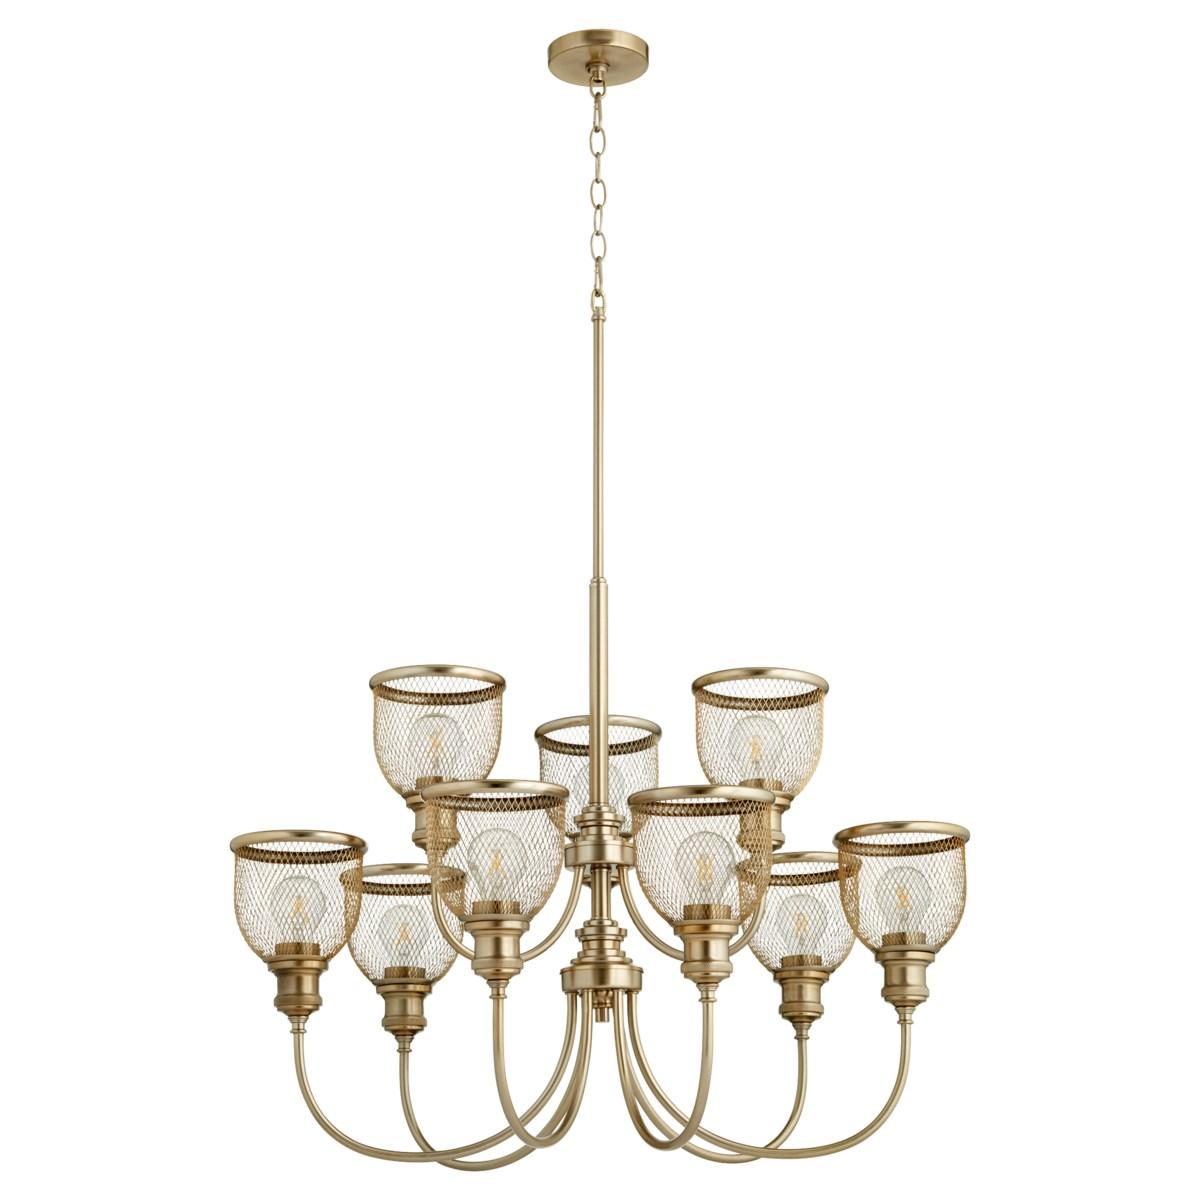 Omni 9 Light Aged Brass Industrial Chandelier